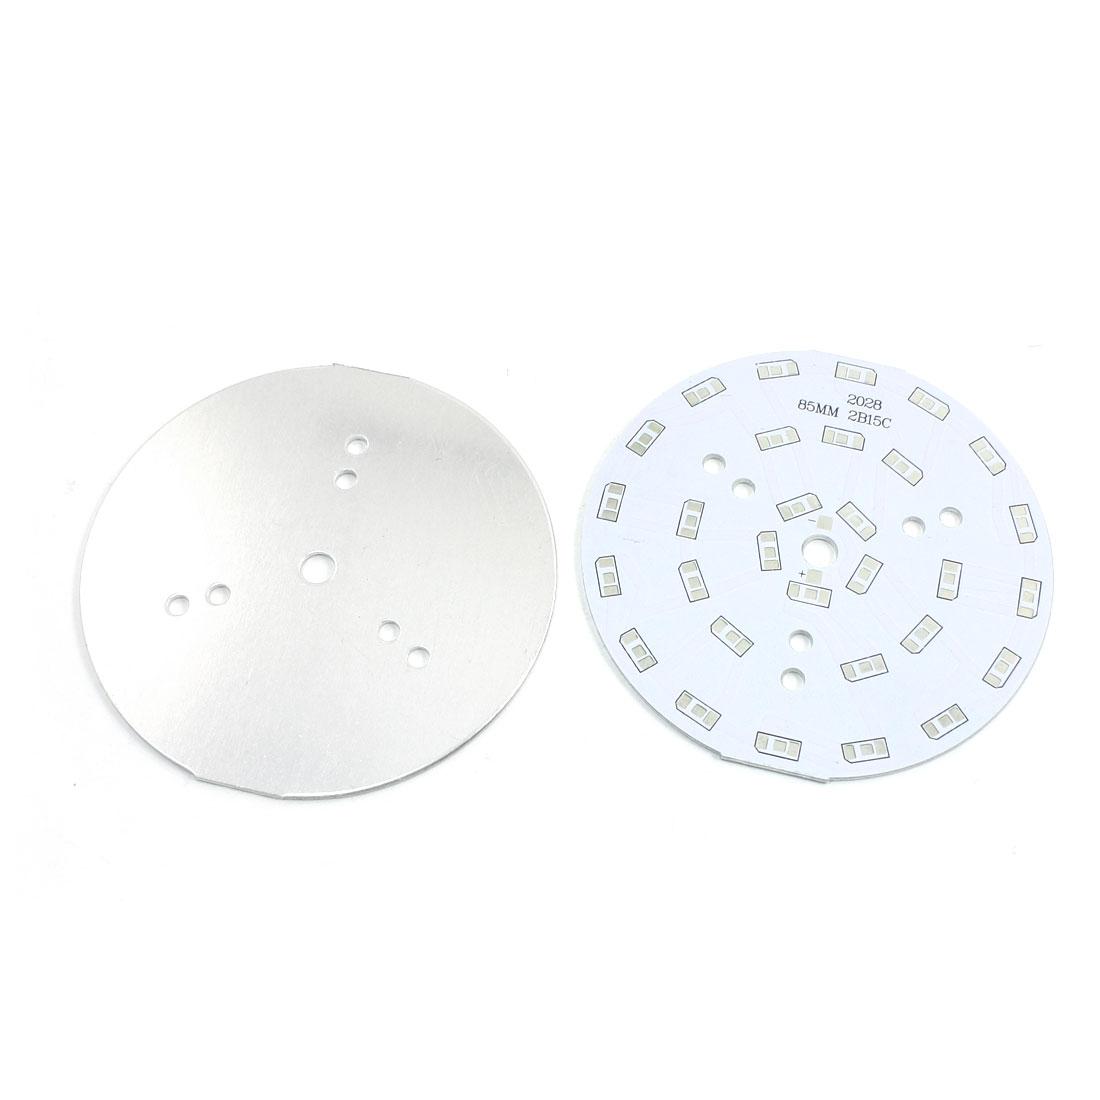 2Pcs 30 x 1/2W 5730 SMD LED High Power DIY Circle Aluminum PCB Circuit Board 85mm Diameter